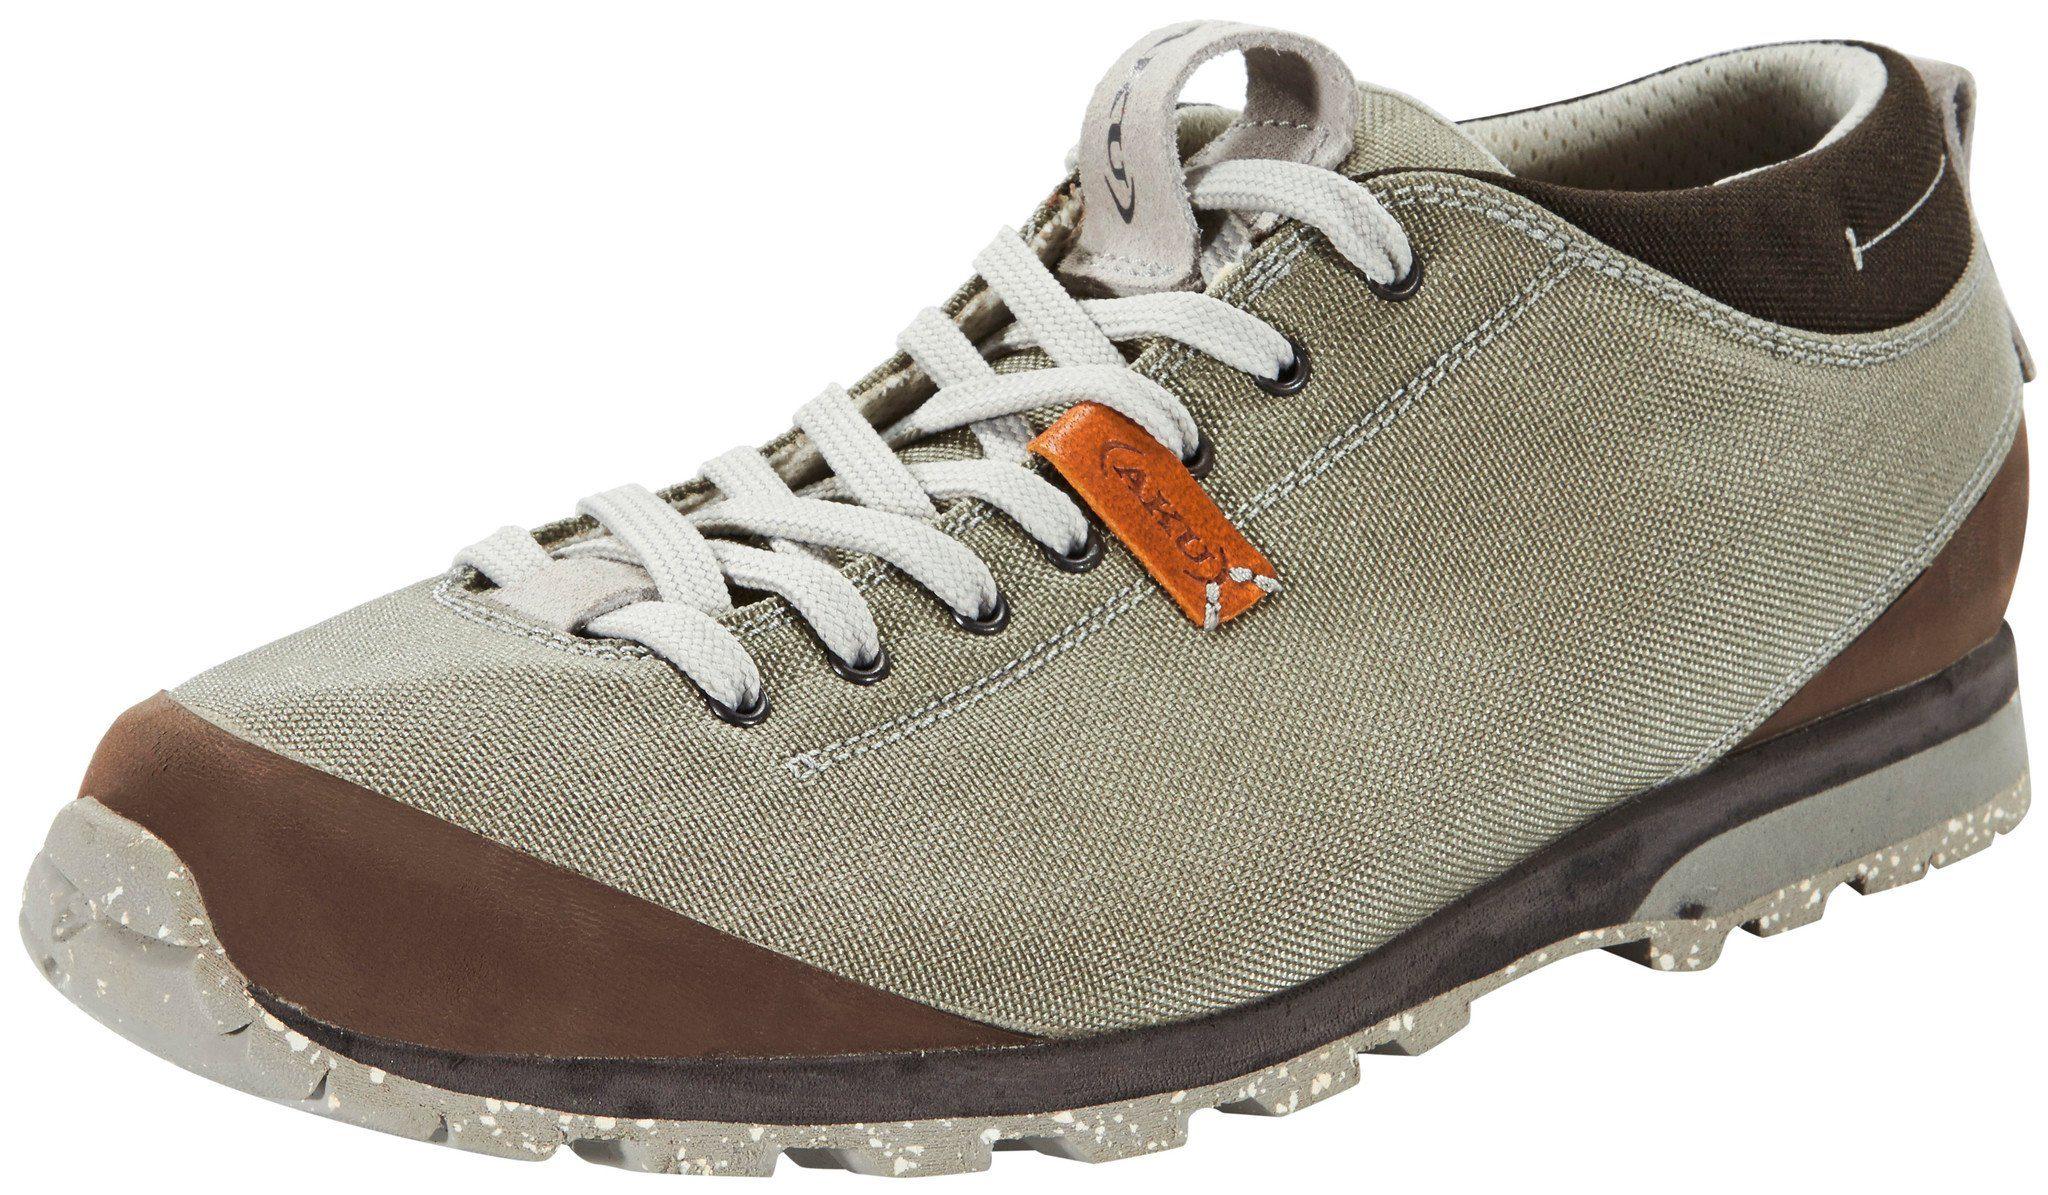 AKU Kletterschuh »Bellamont Air Shoes Men«